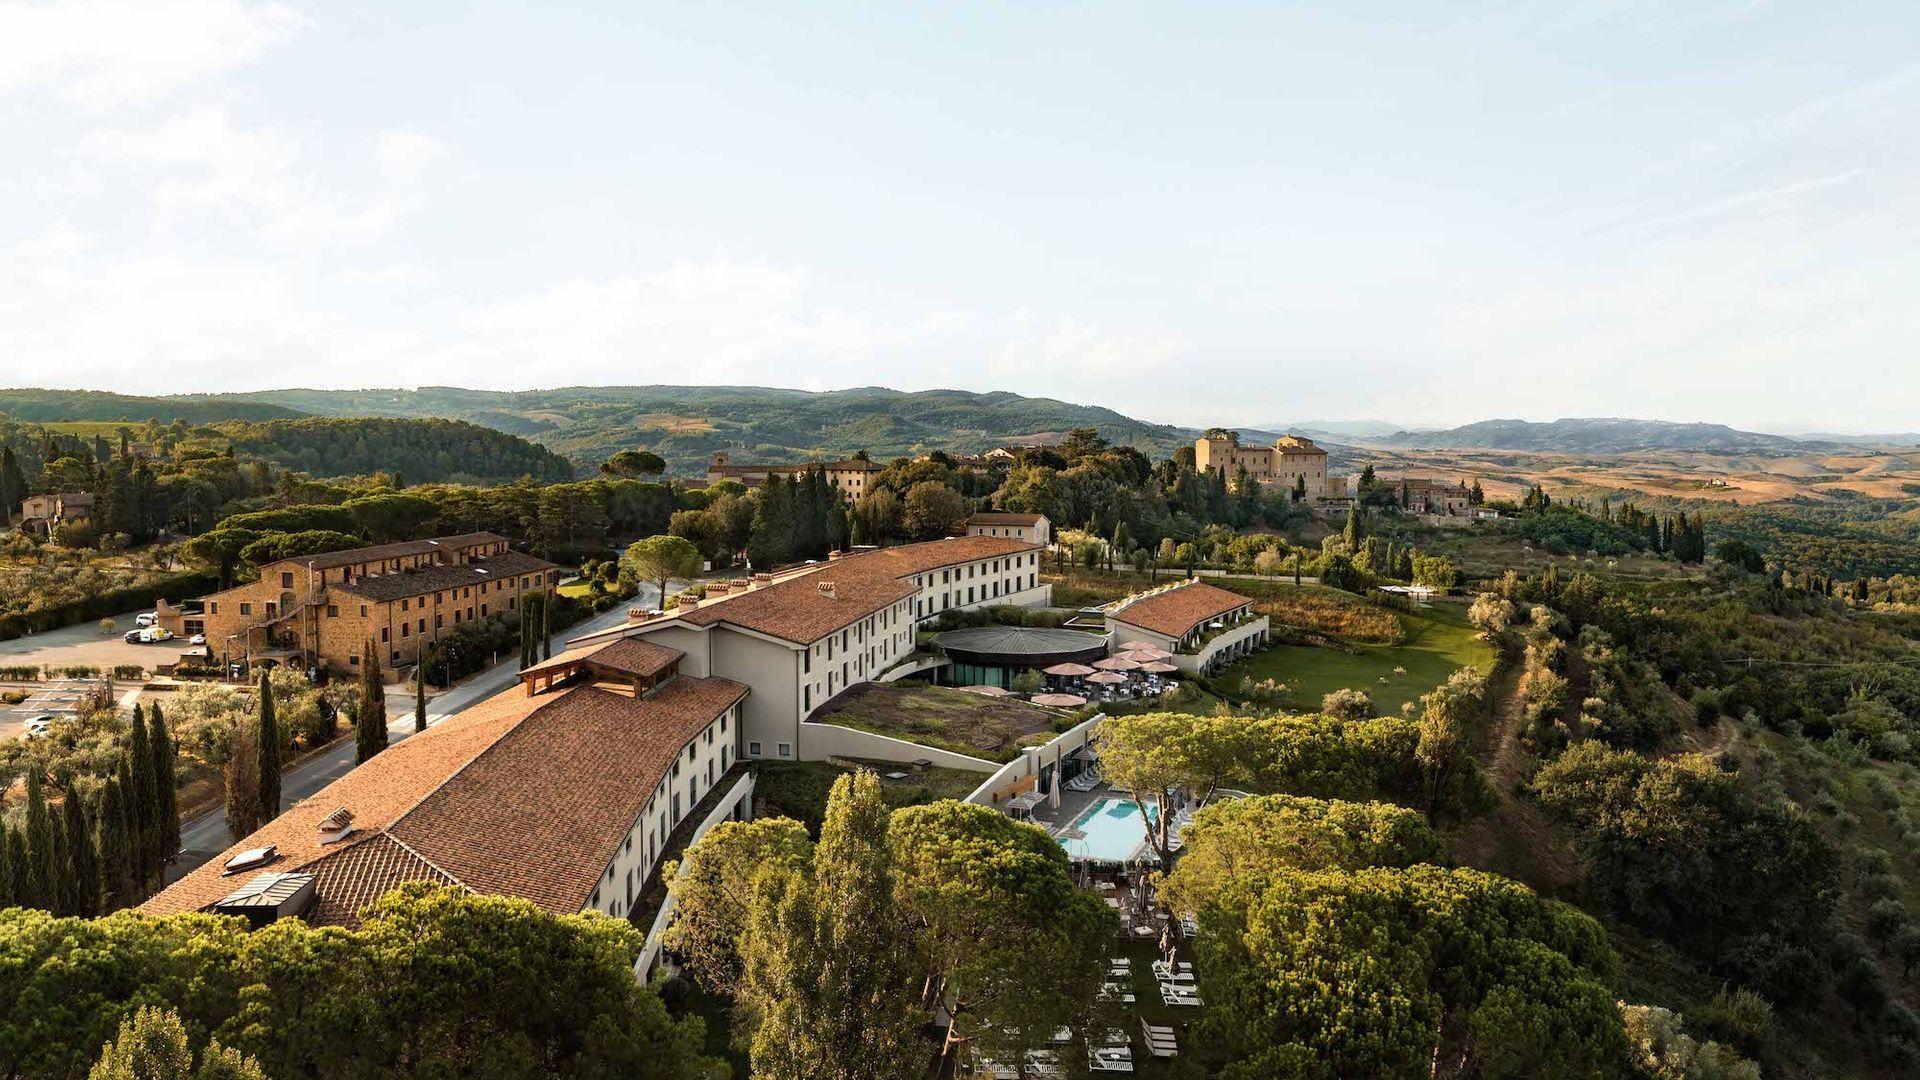 5* Das Toscana Resort Castelfalfi